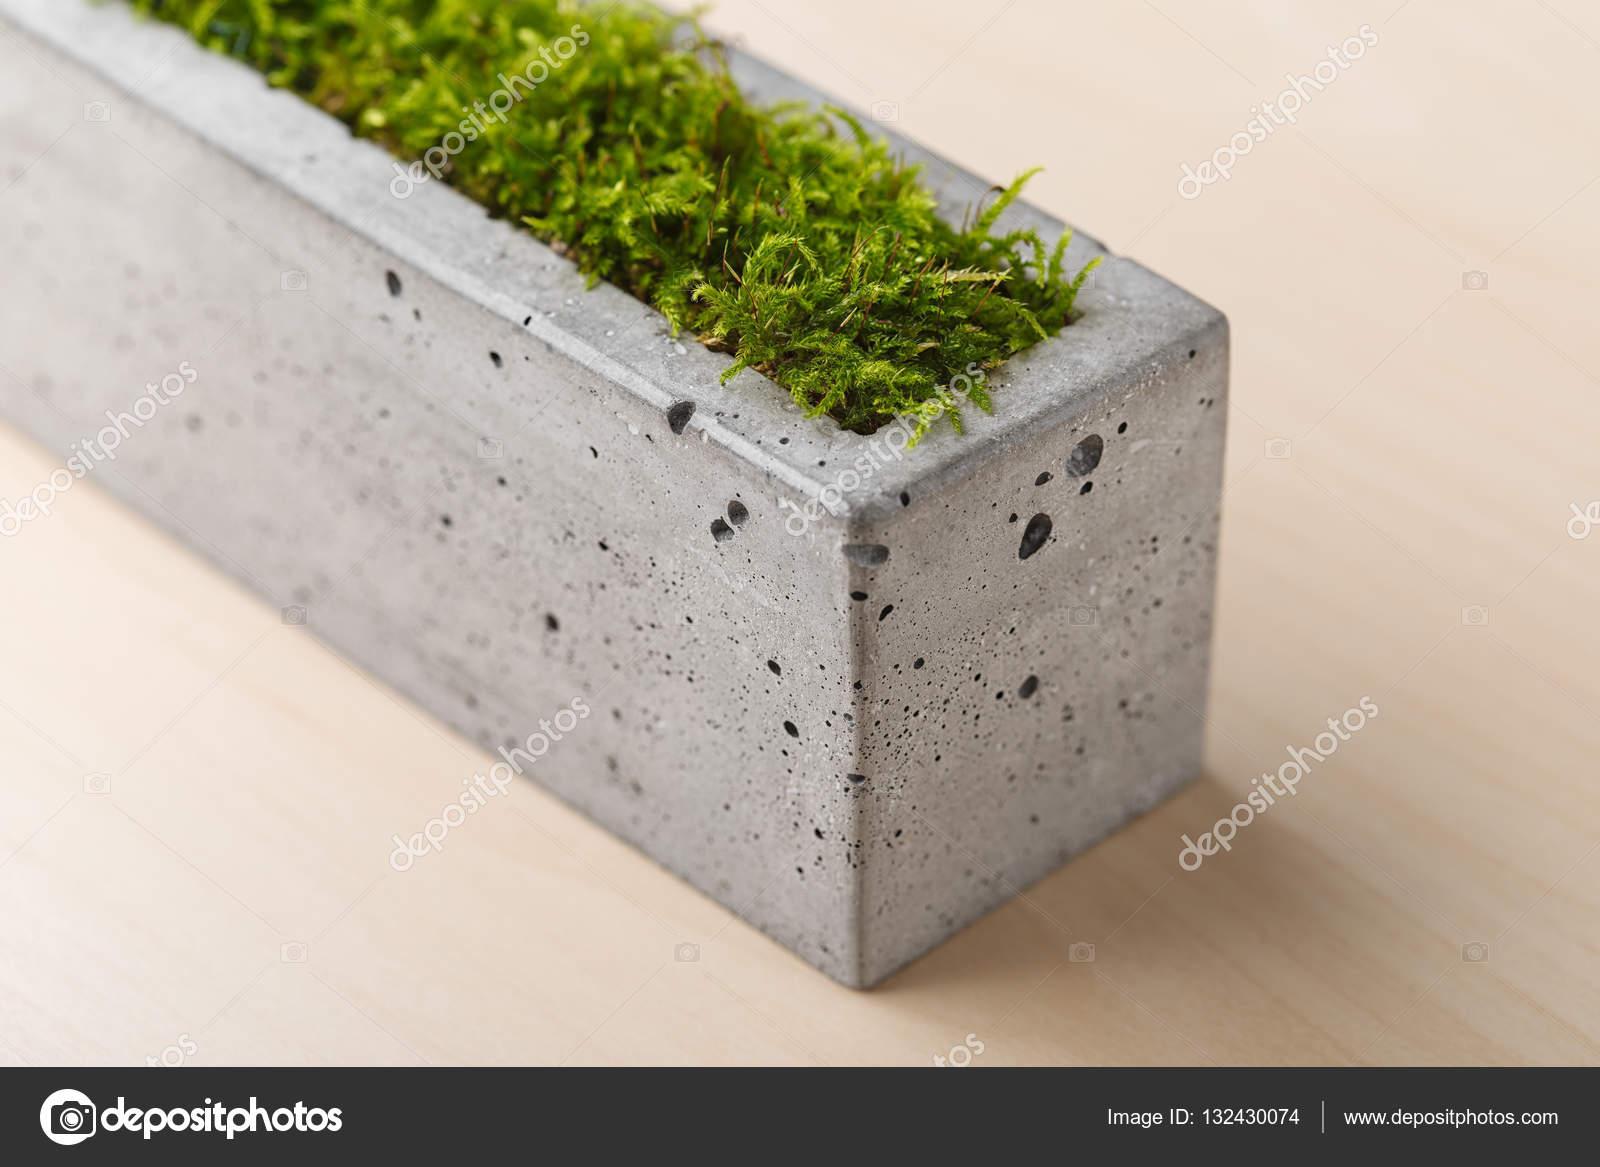 stilvolle beton pflanzgefäße mit grünem moos — stockfoto